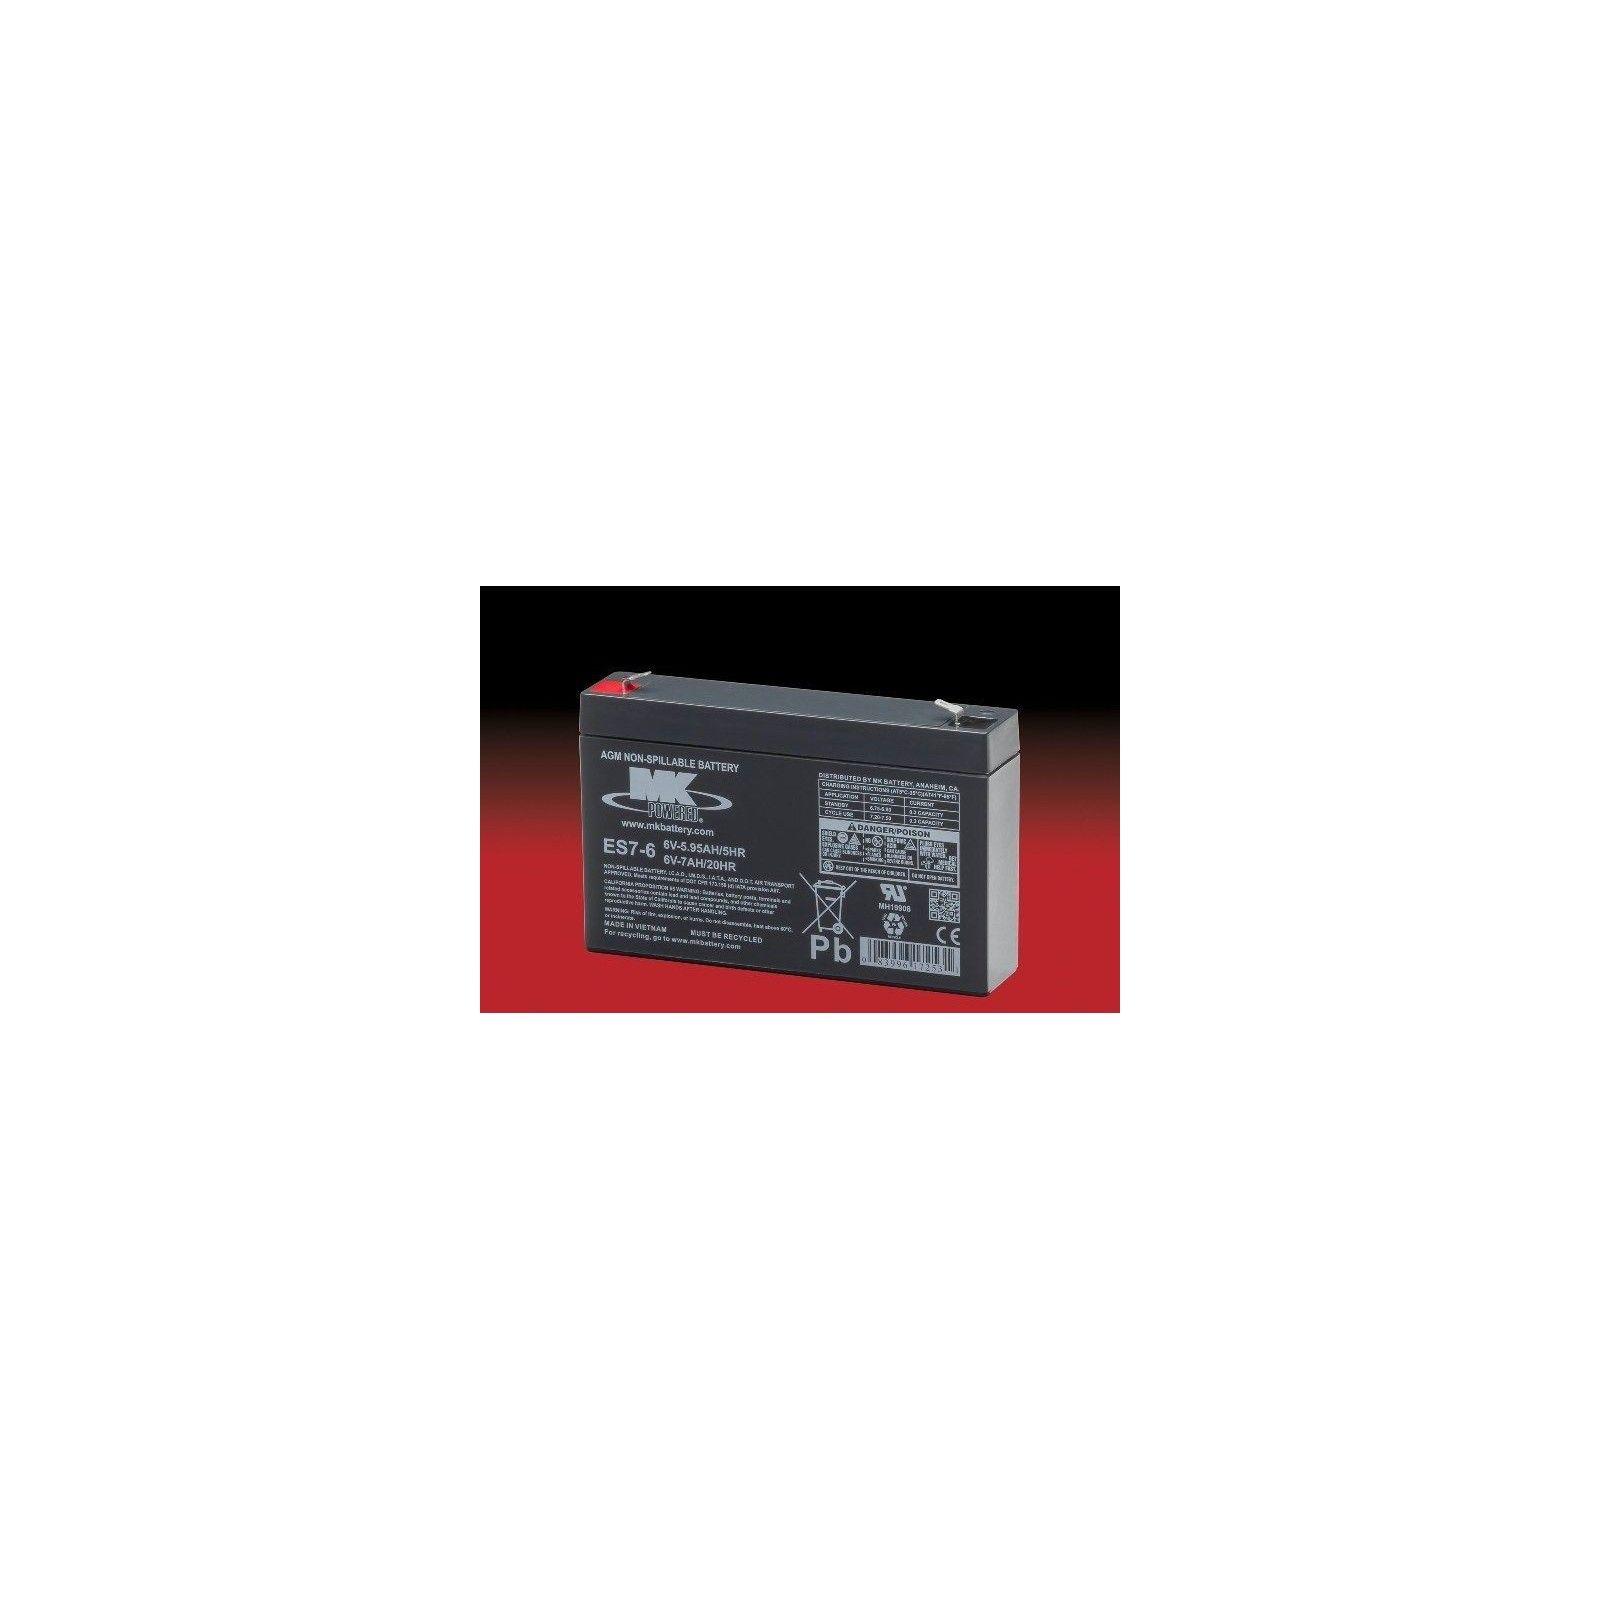 Batería MK ES7-6 7Ah 6V Agm MK - 1